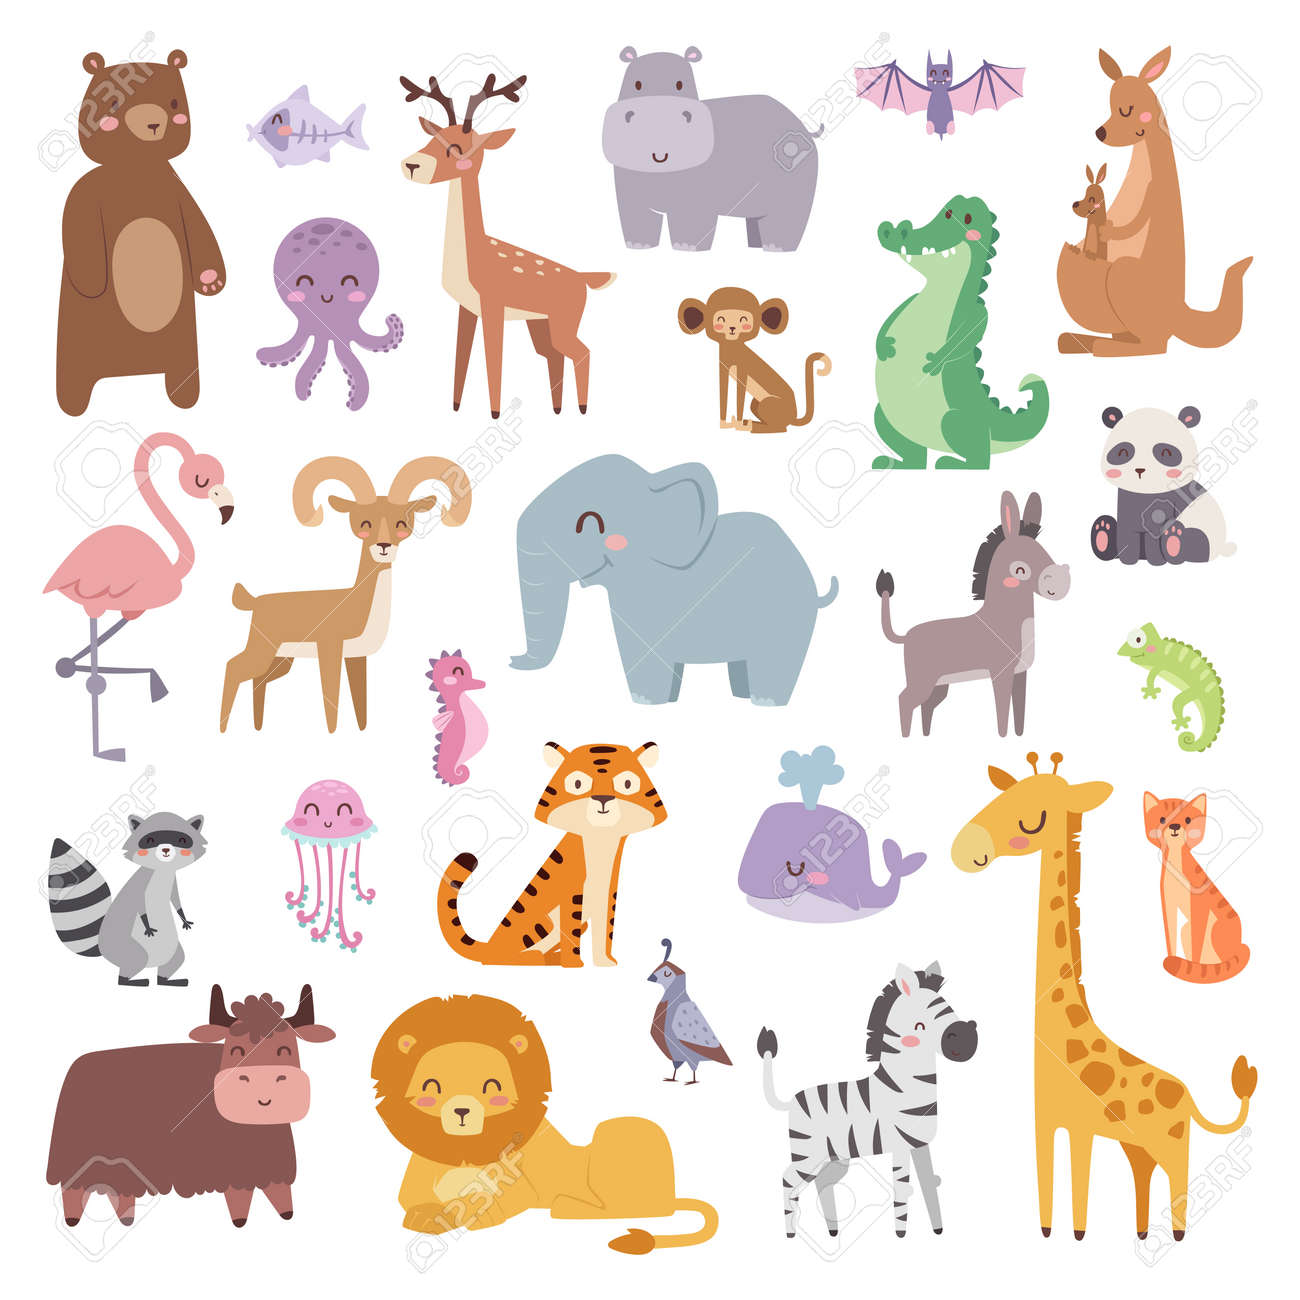 Cartoon animals character and wild cartoon cute animals collections vector. Cartoon zoo animals big set wildlife mammal flat vector illustration. - 54067639